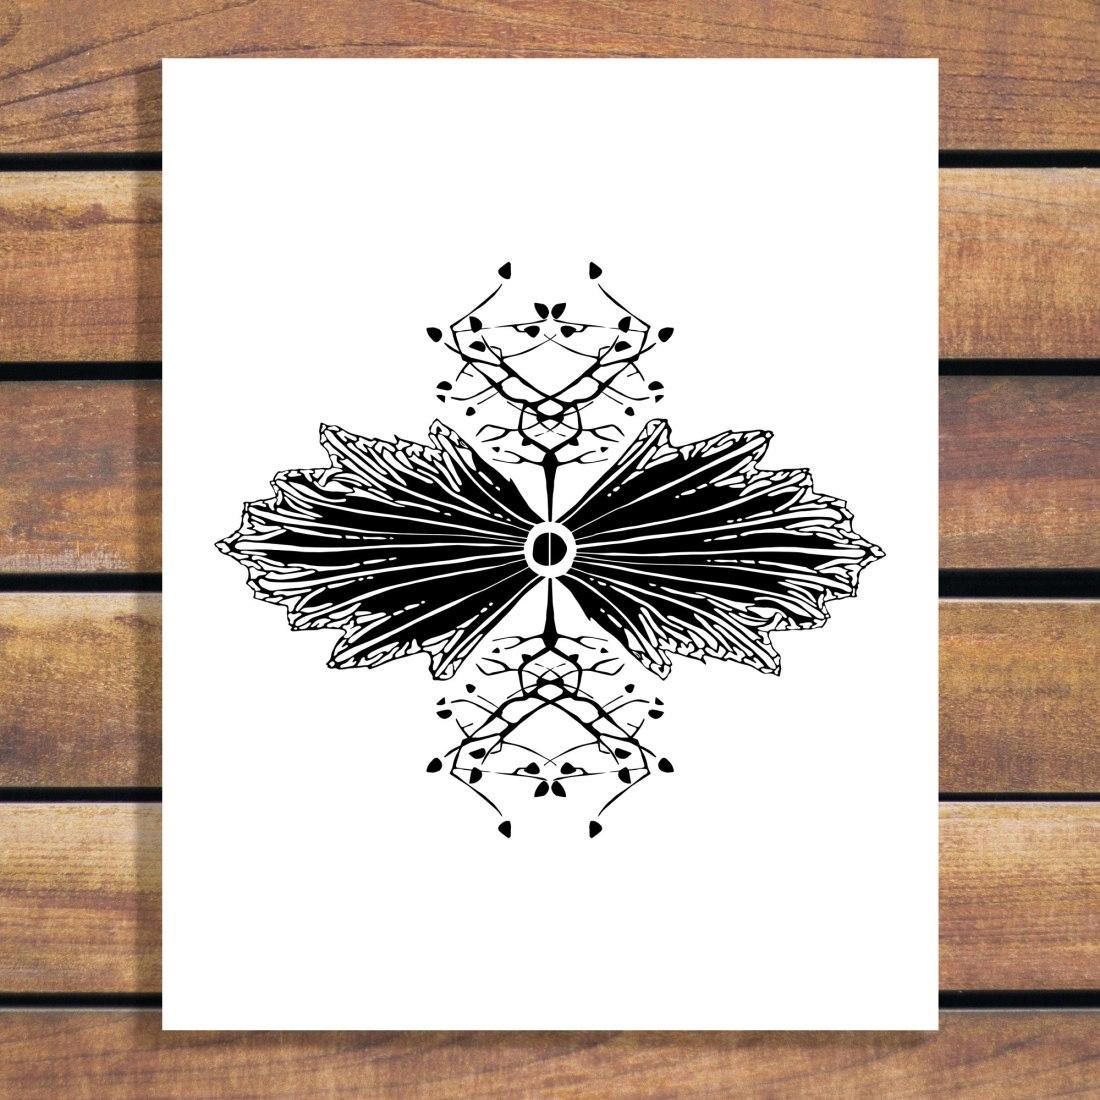 Brina Schenk Illustration - Organic Symmetry Black and White illustration art print